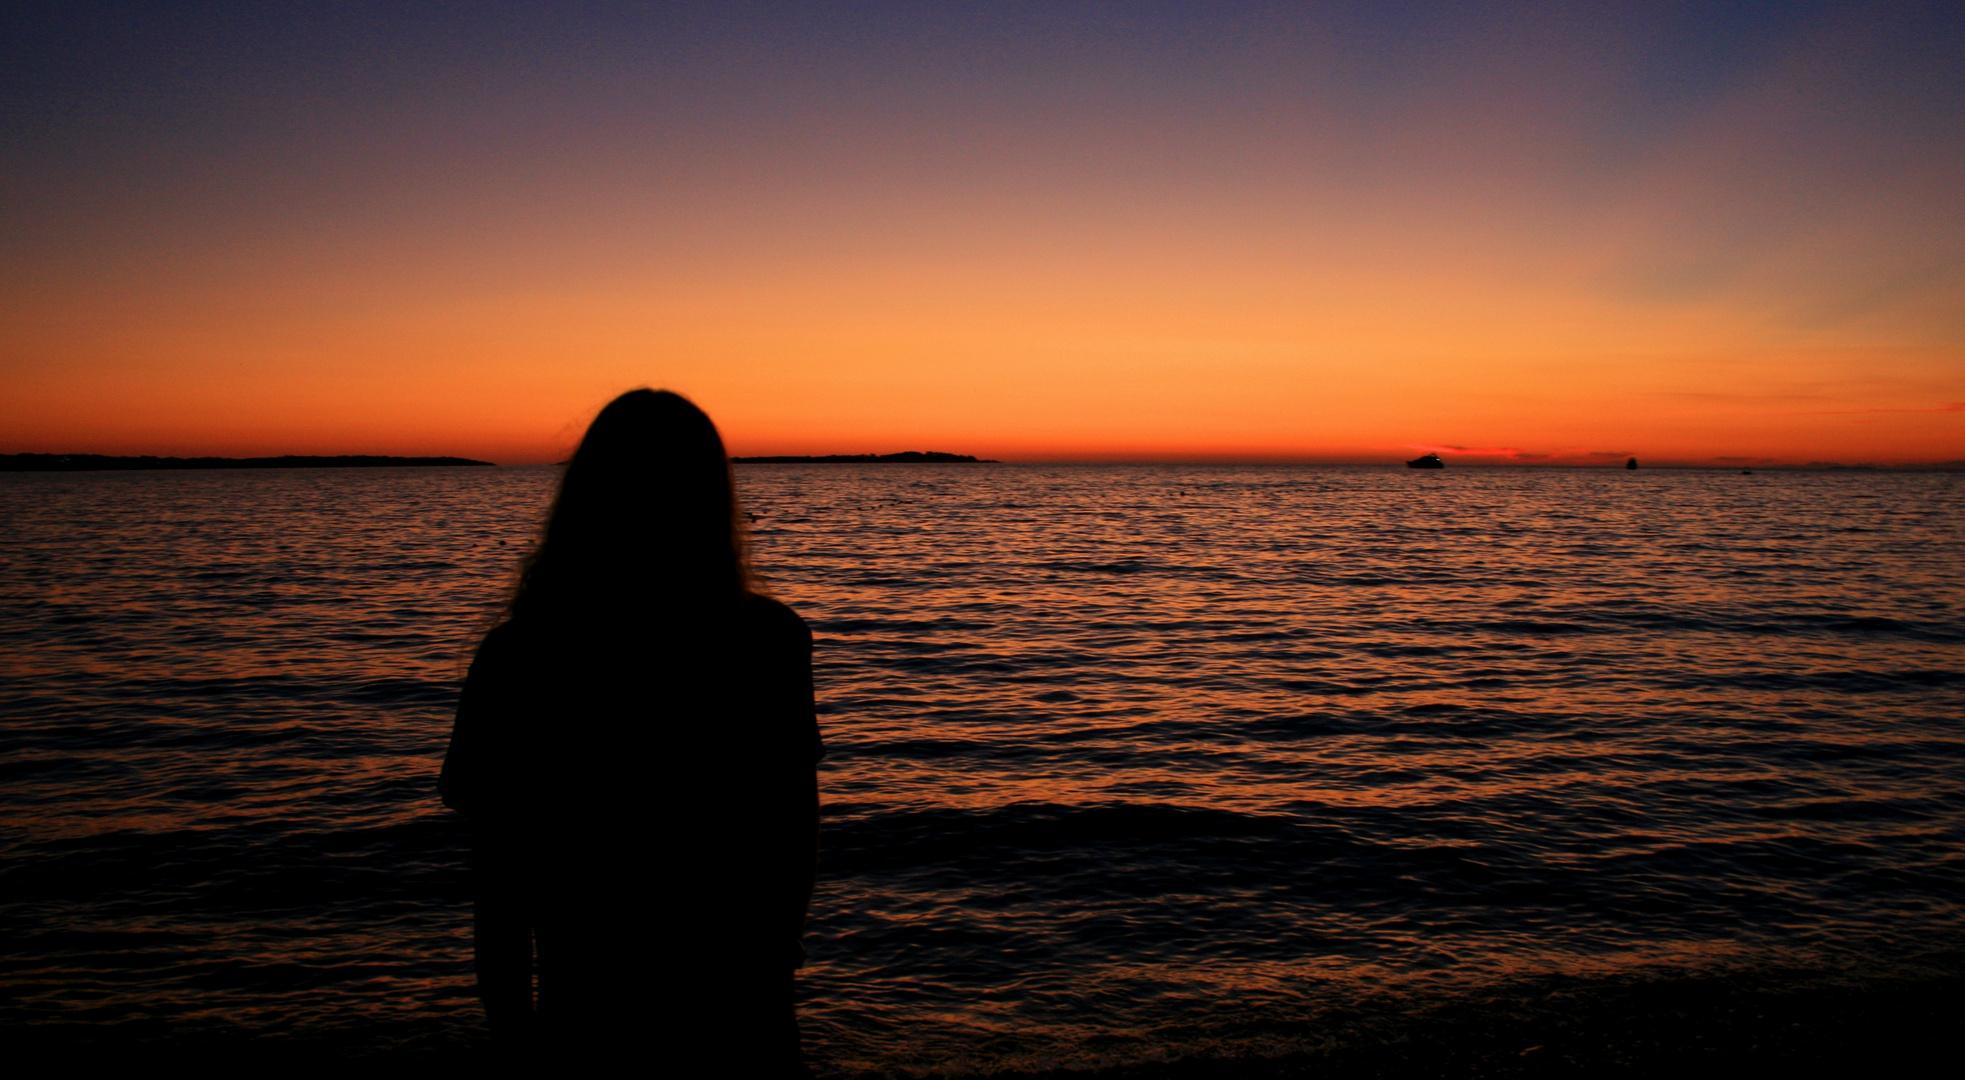 Sundown at sea level...